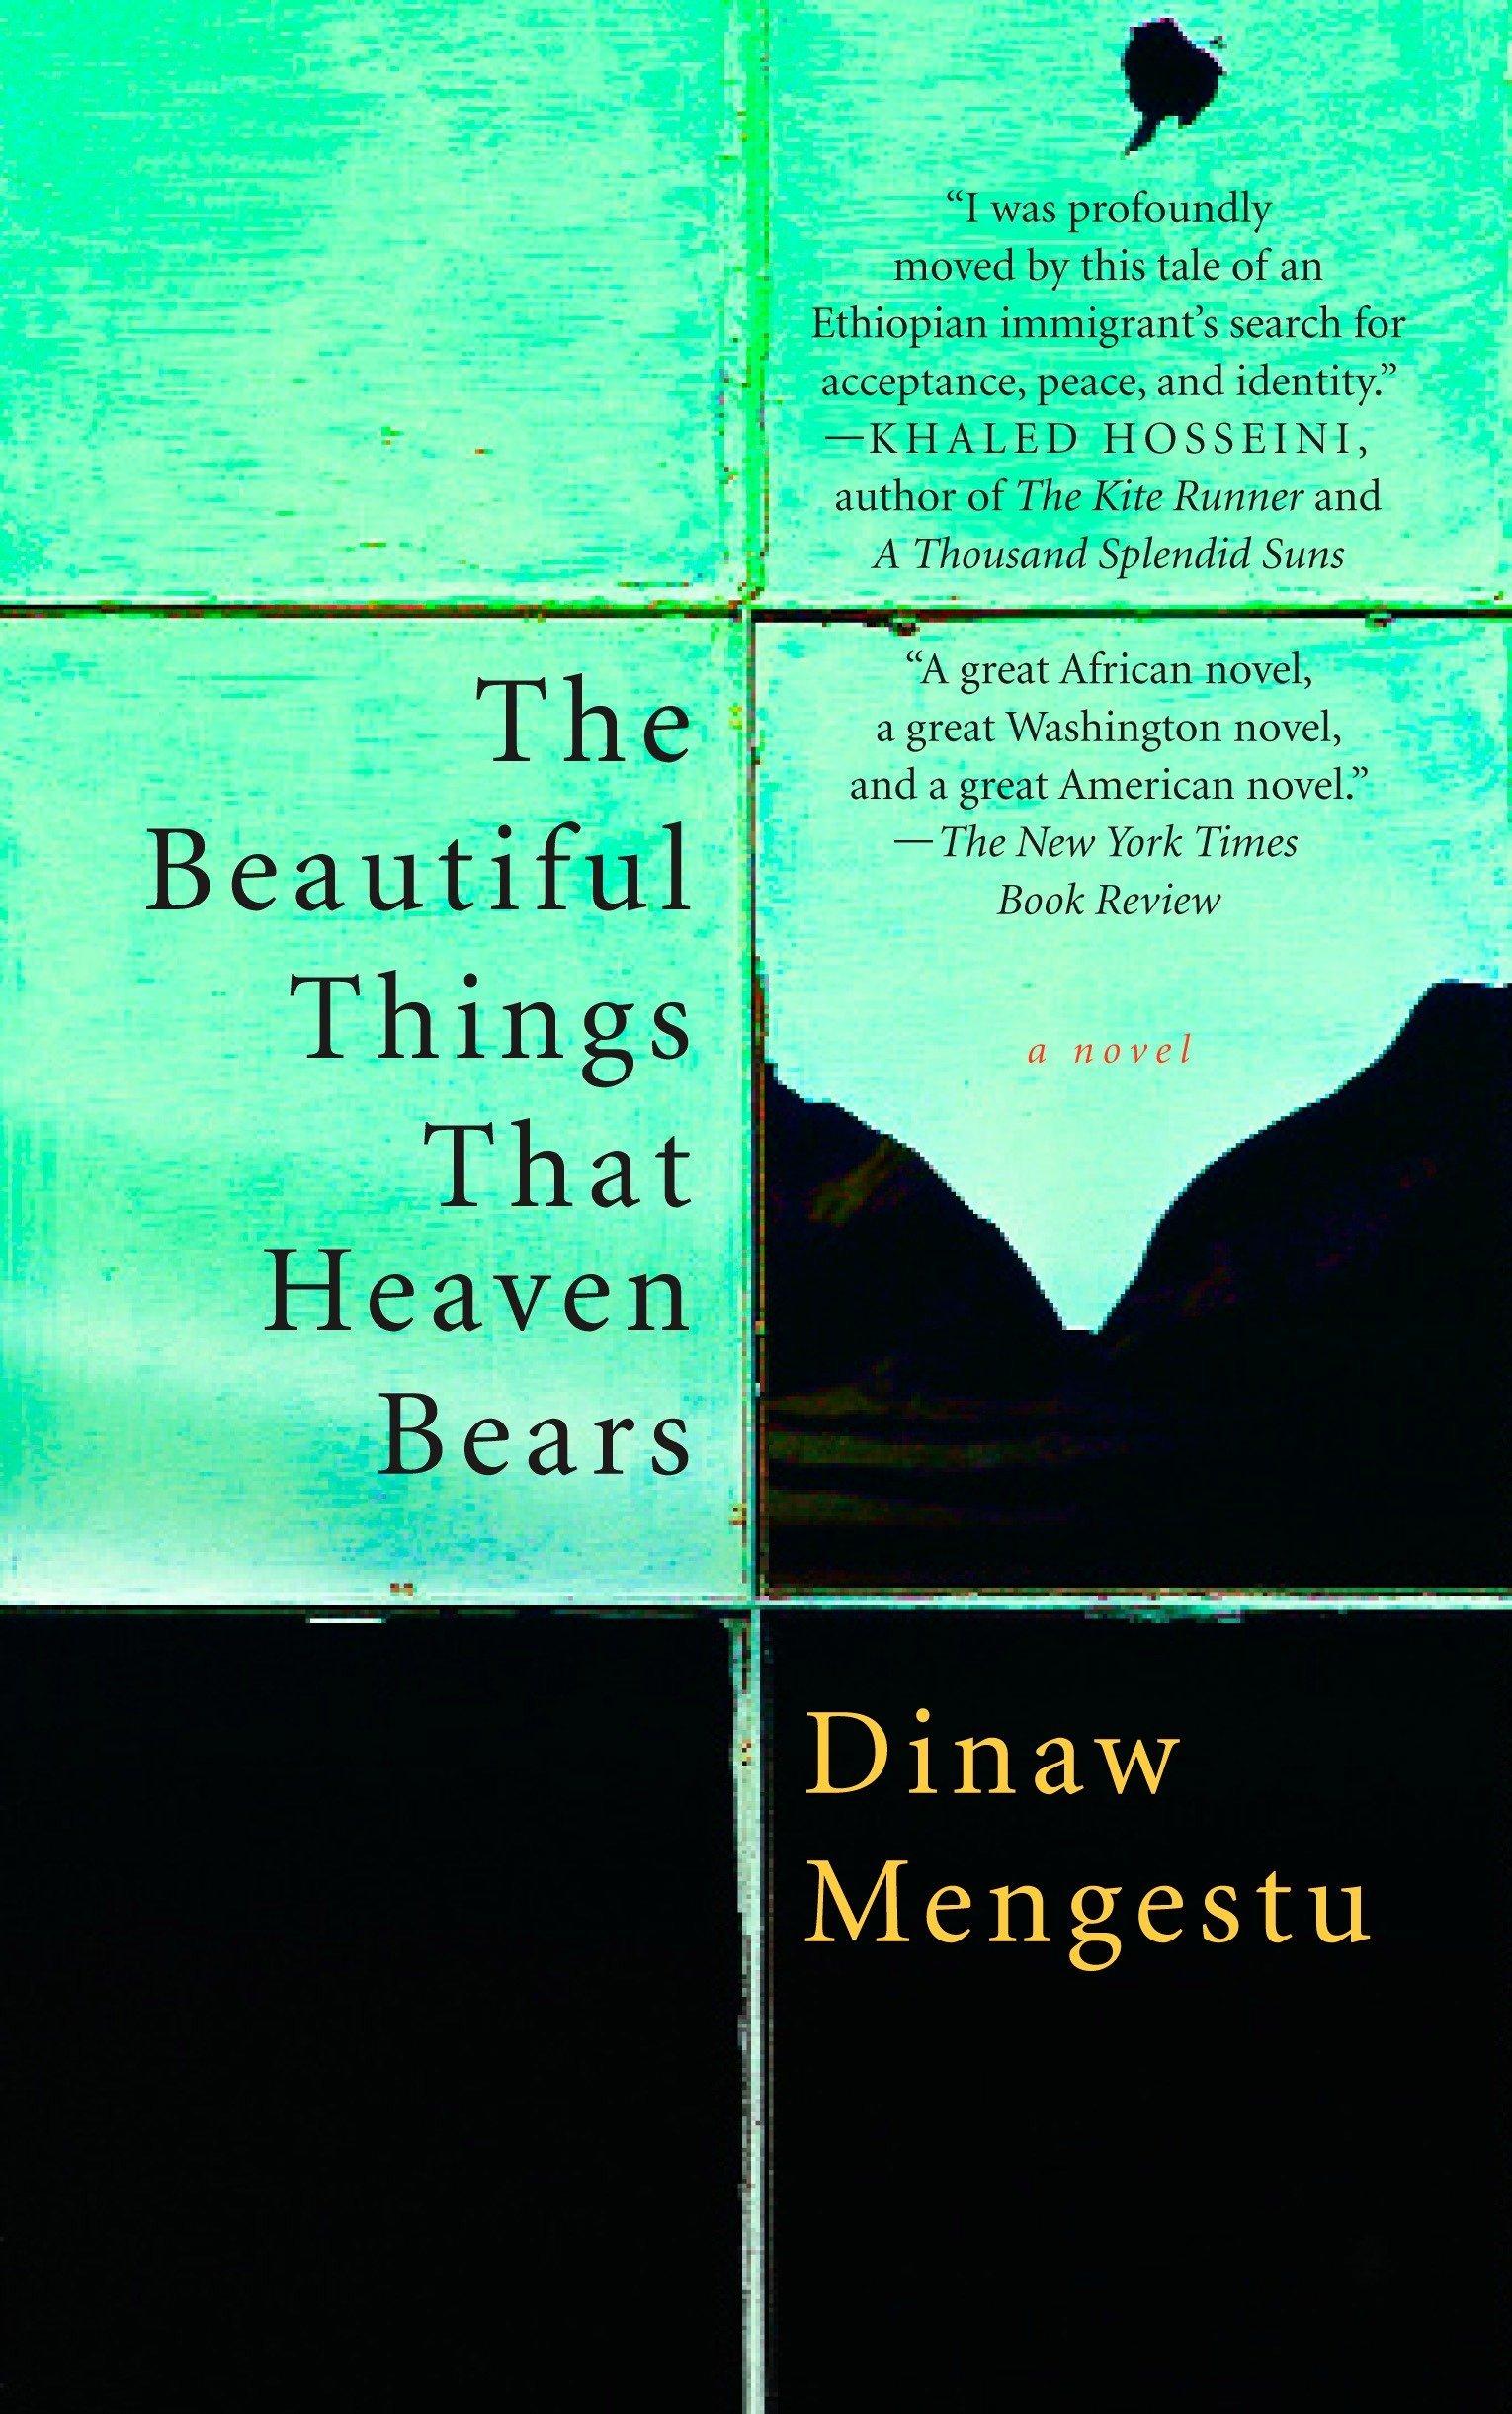 Amazon.com: The Beautiful Things That Heaven Bears (9781594482854): Dinaw  Mengestu: Books